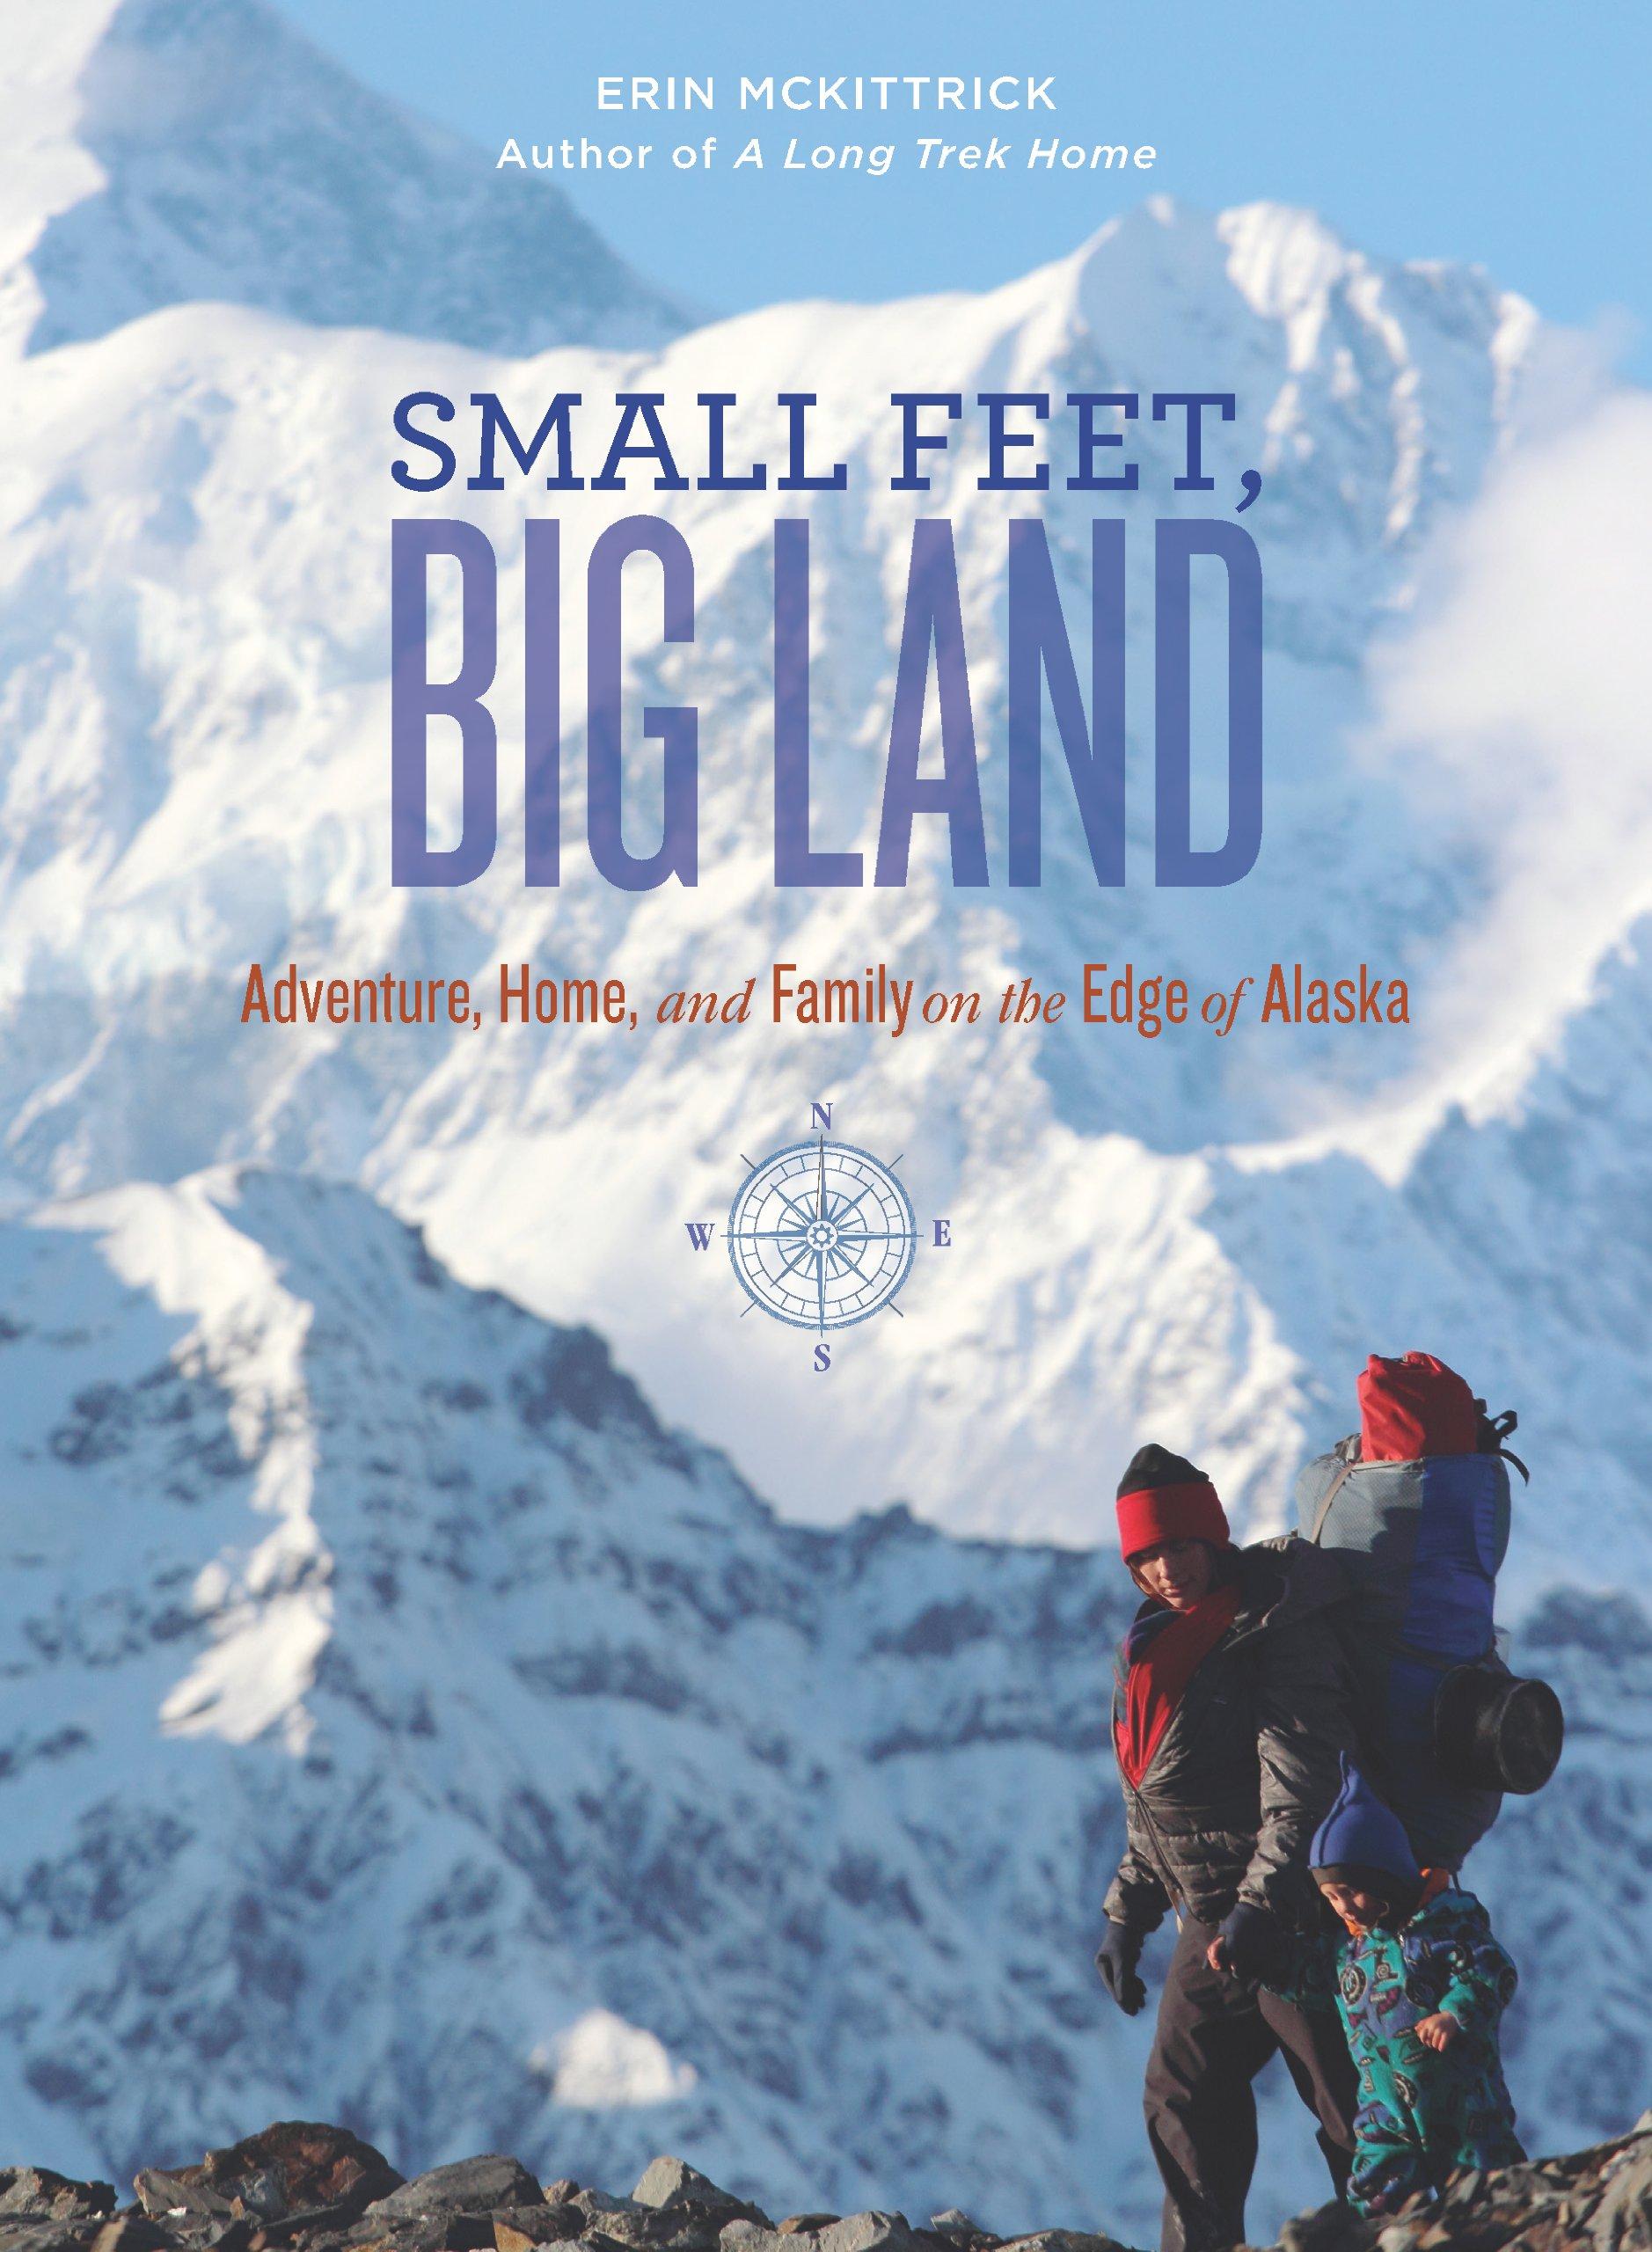 Small Feet, Big Land: Adventure, Home, and Family on the Edge of Alaska:  Erin McKittrick: 9781594857362: Amazon.com: Books